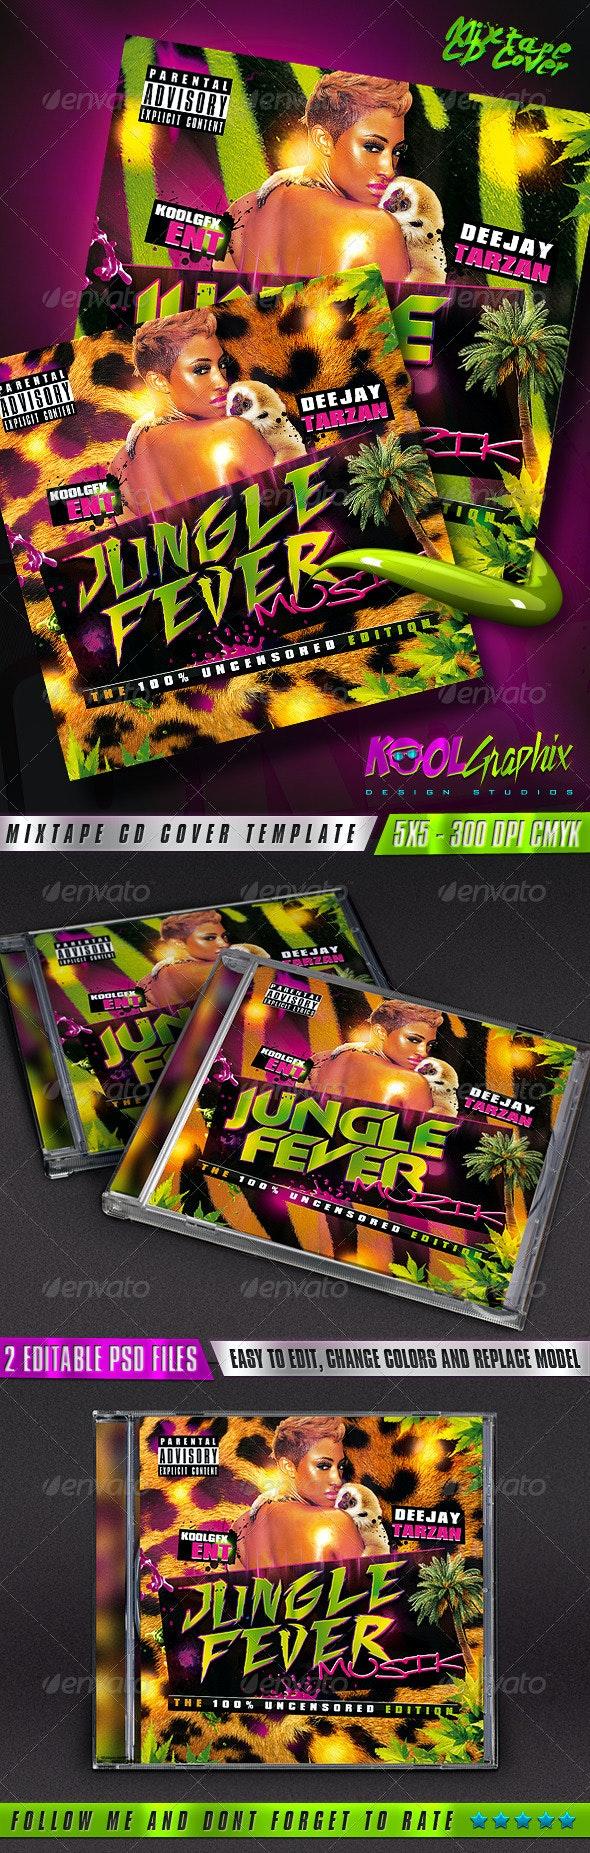 Jungle Fever - Mixtape CD Cover - CD & DVD Artwork Print Templates